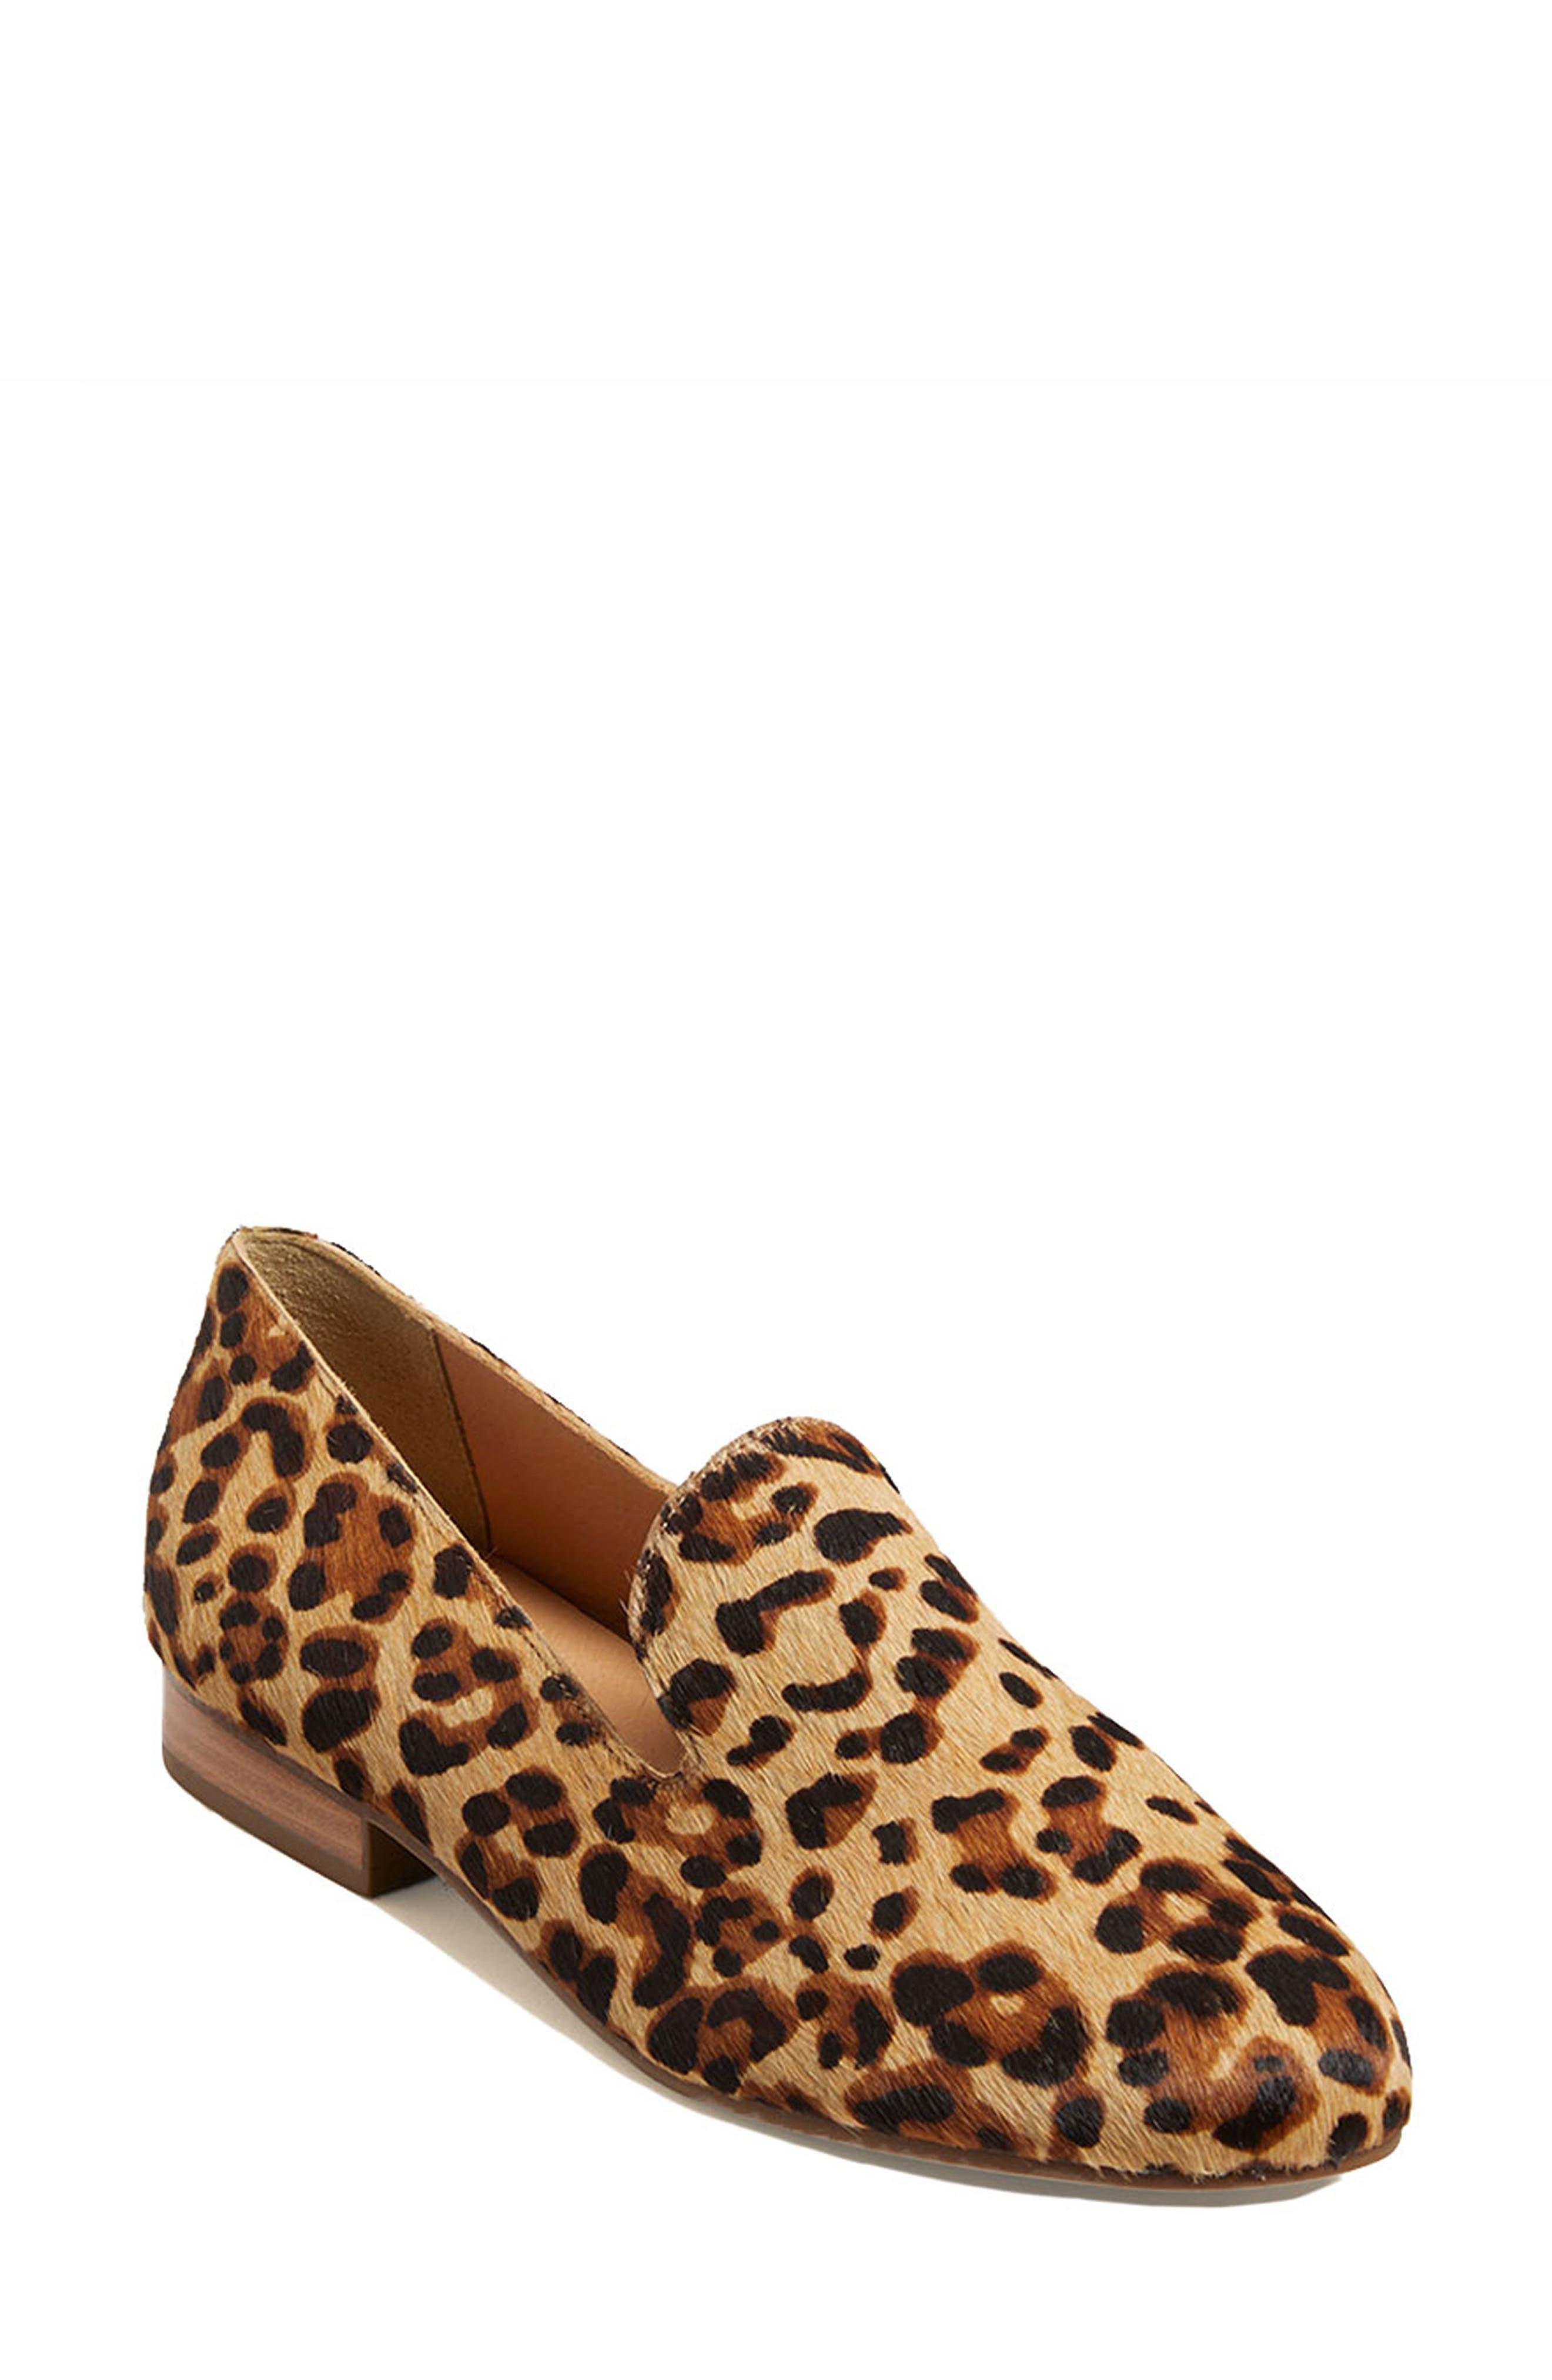 Audrey Genuine Calf Hair Loafer